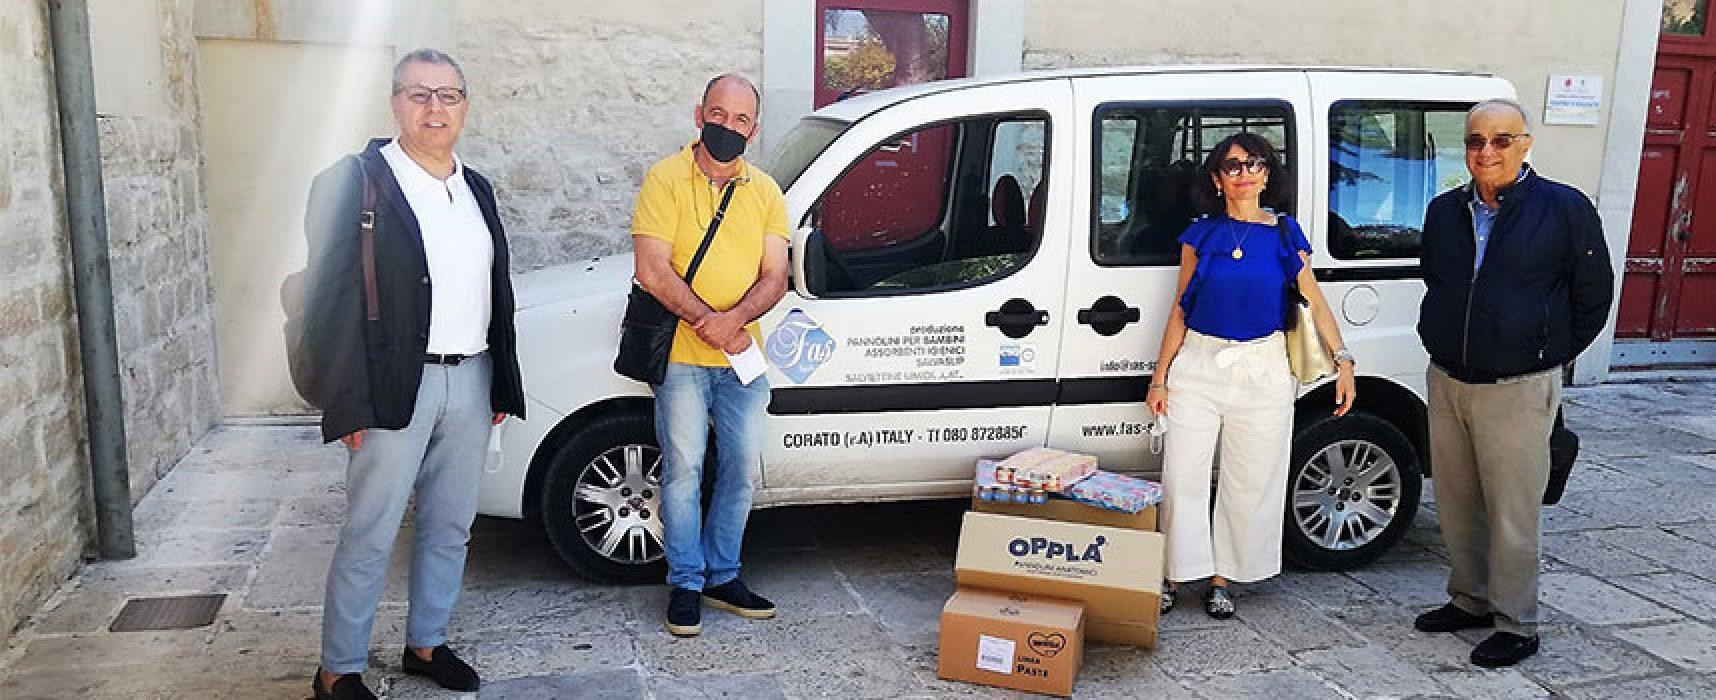 Rotary Club Bisceglie protagonista tra sociale e workshop